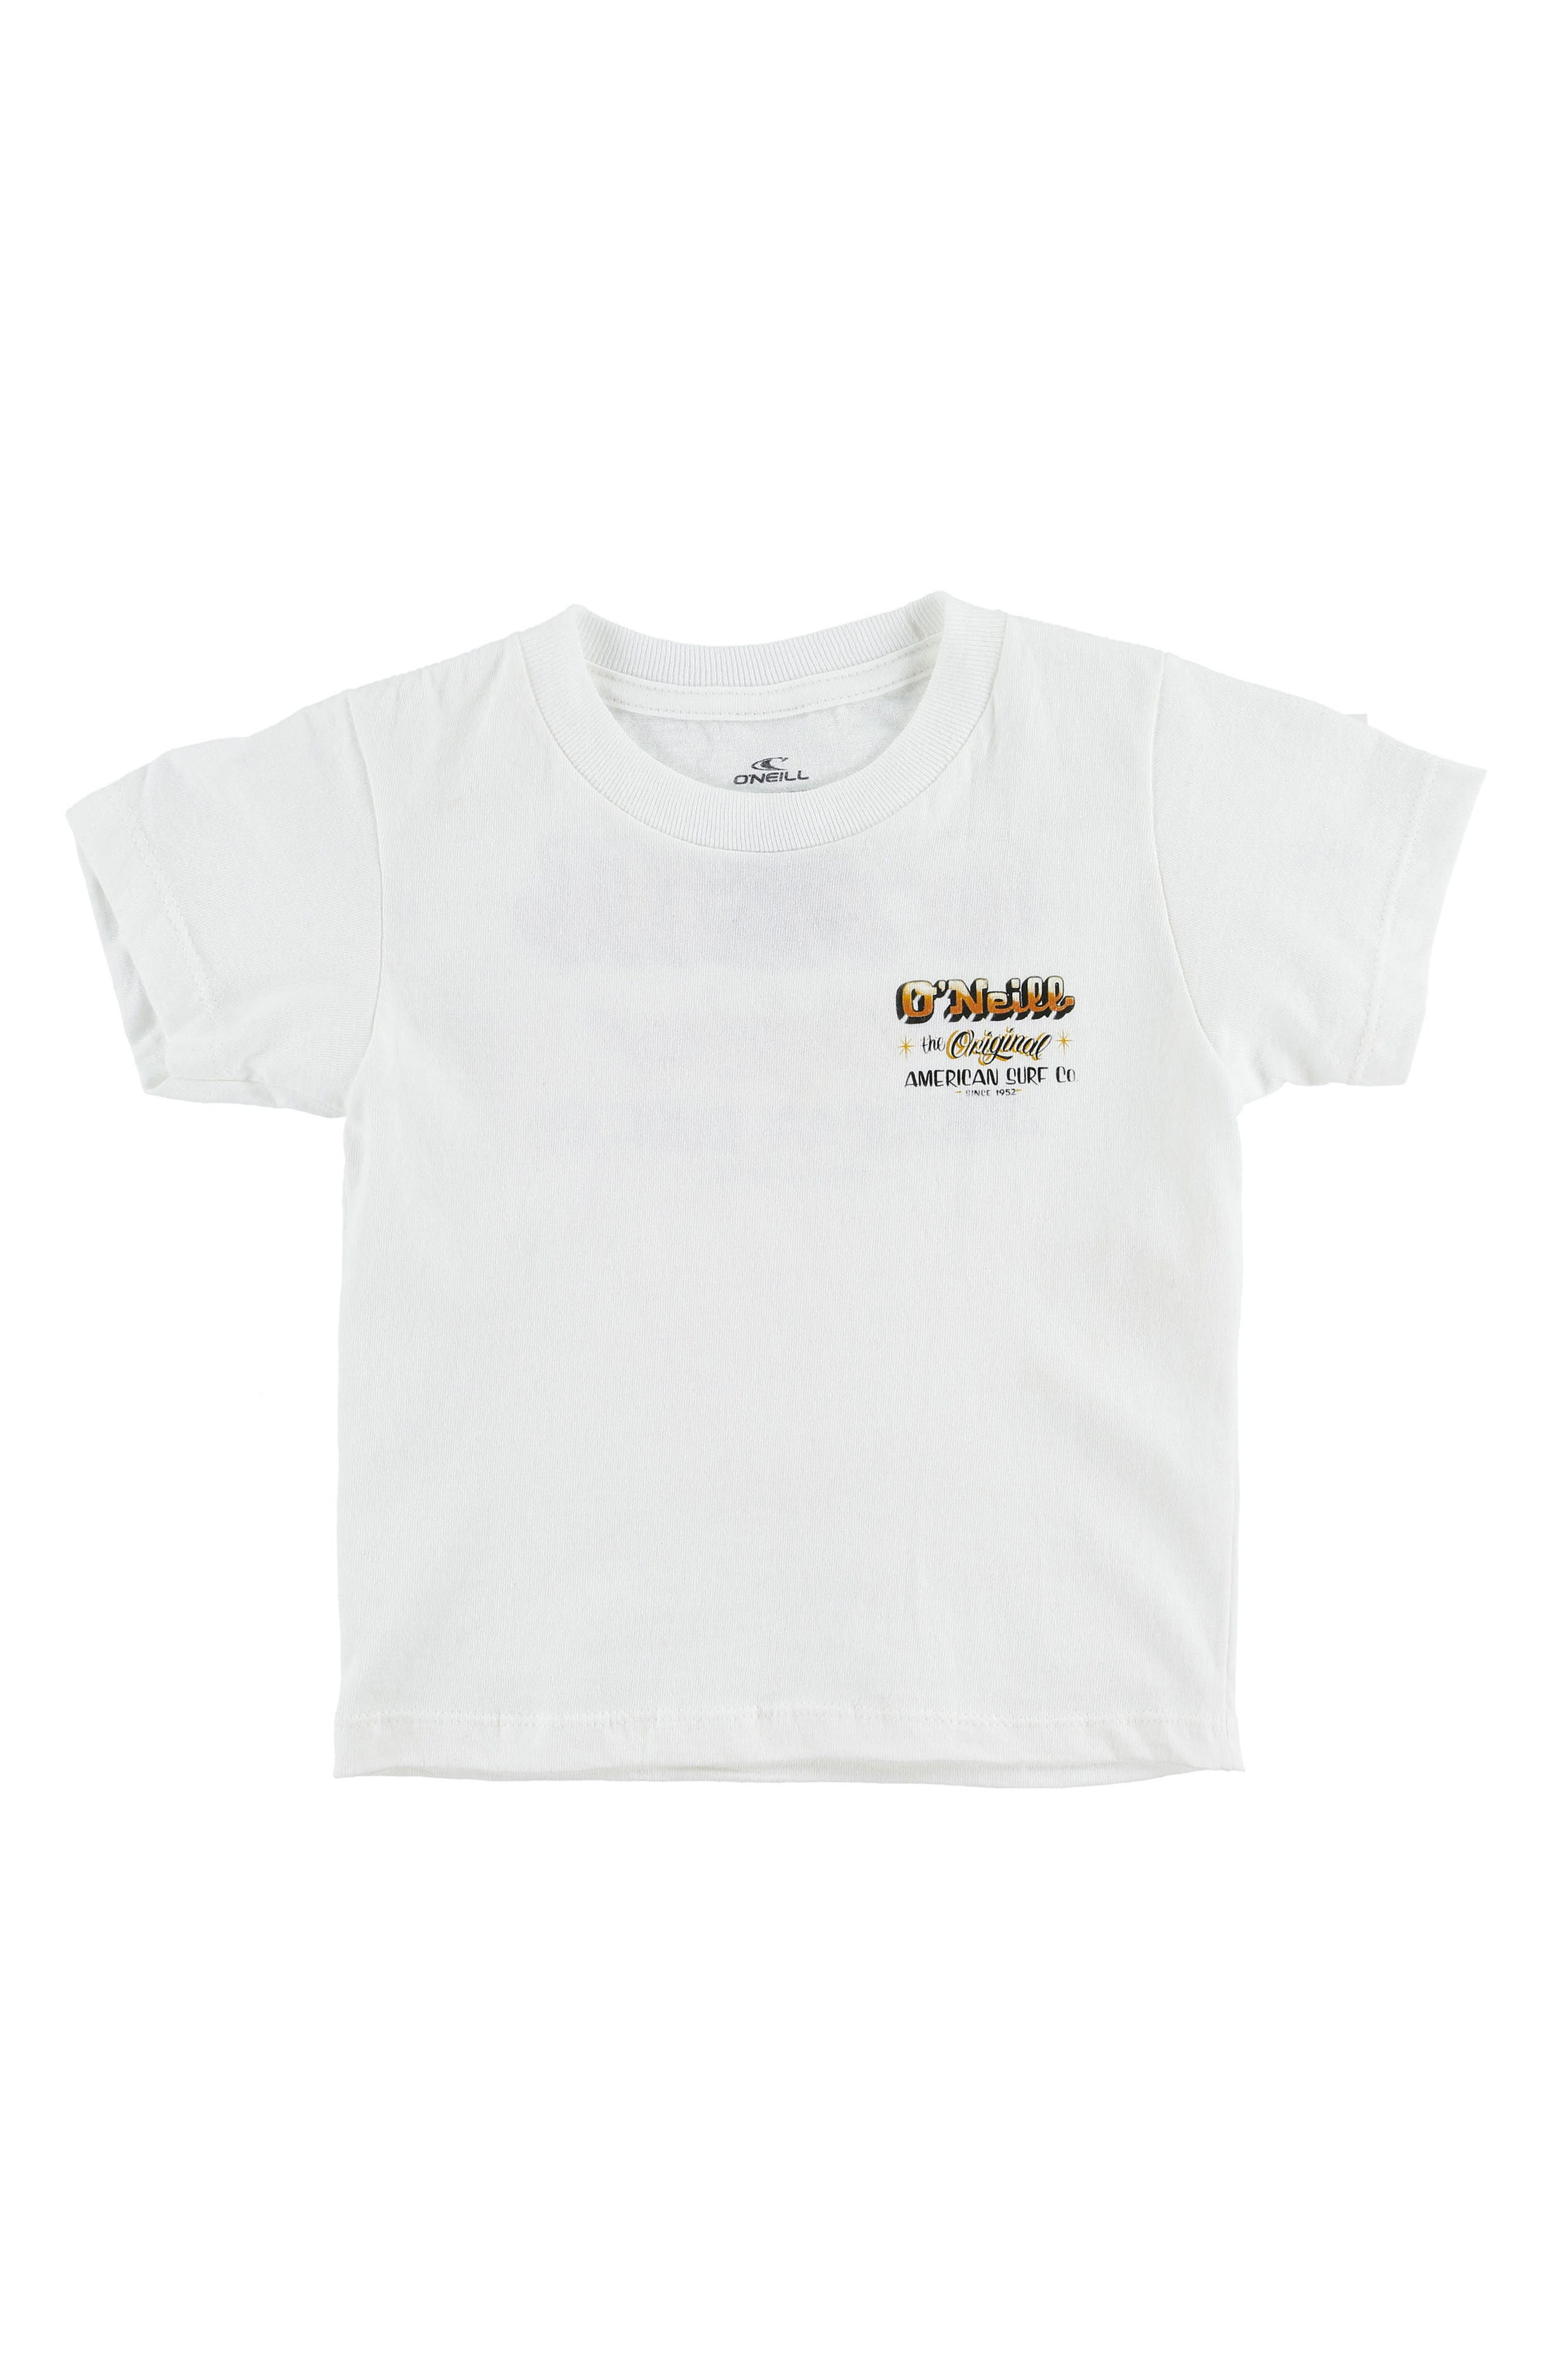 Tuki Graphic T-Shirt,                             Main thumbnail 1, color,                             100